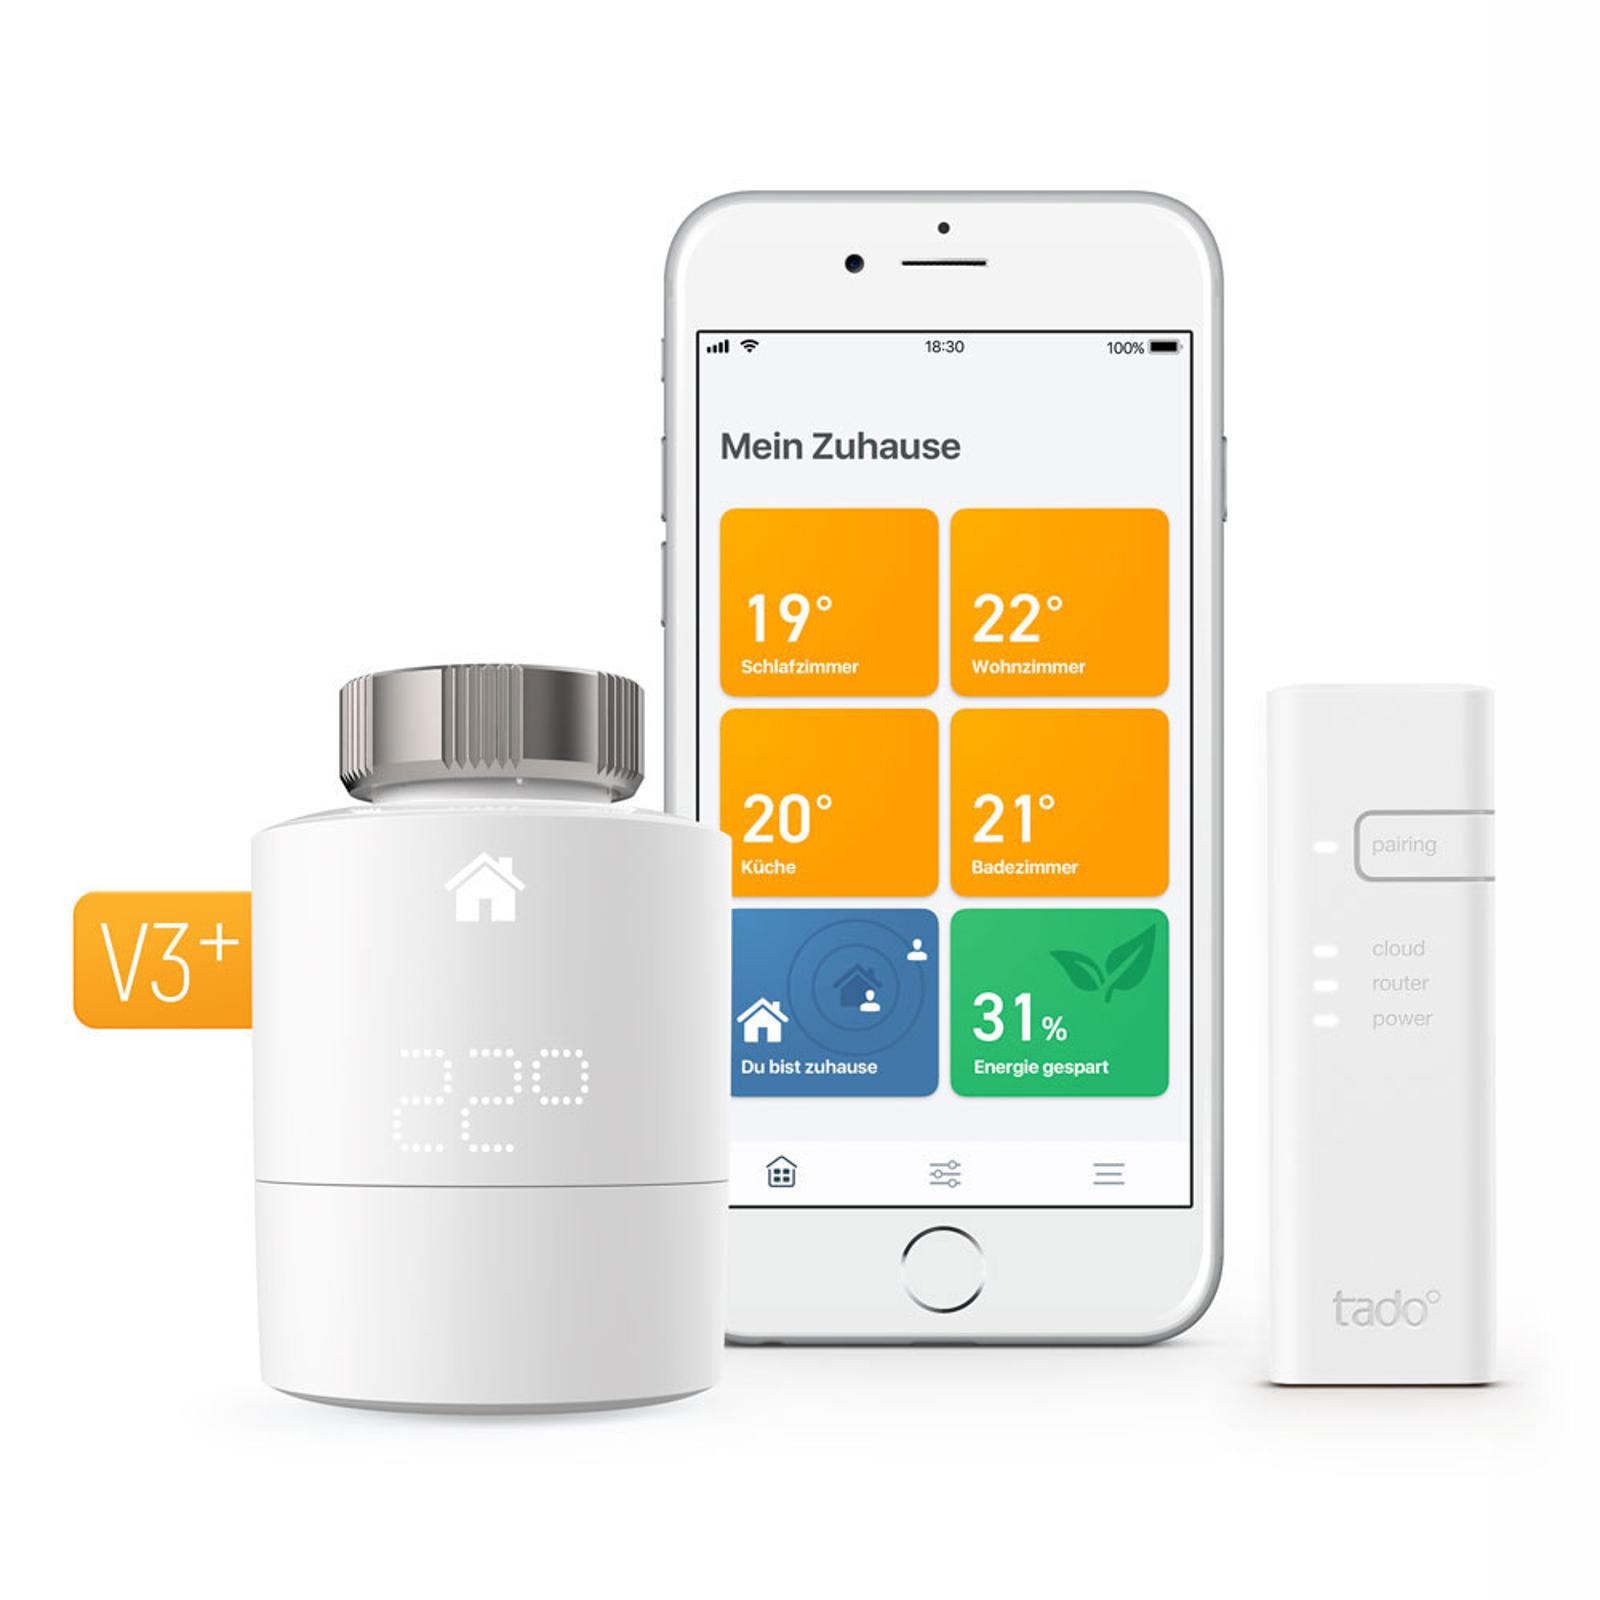 tado° Smartes Heizkörper-Thermostat StarterKit V3+